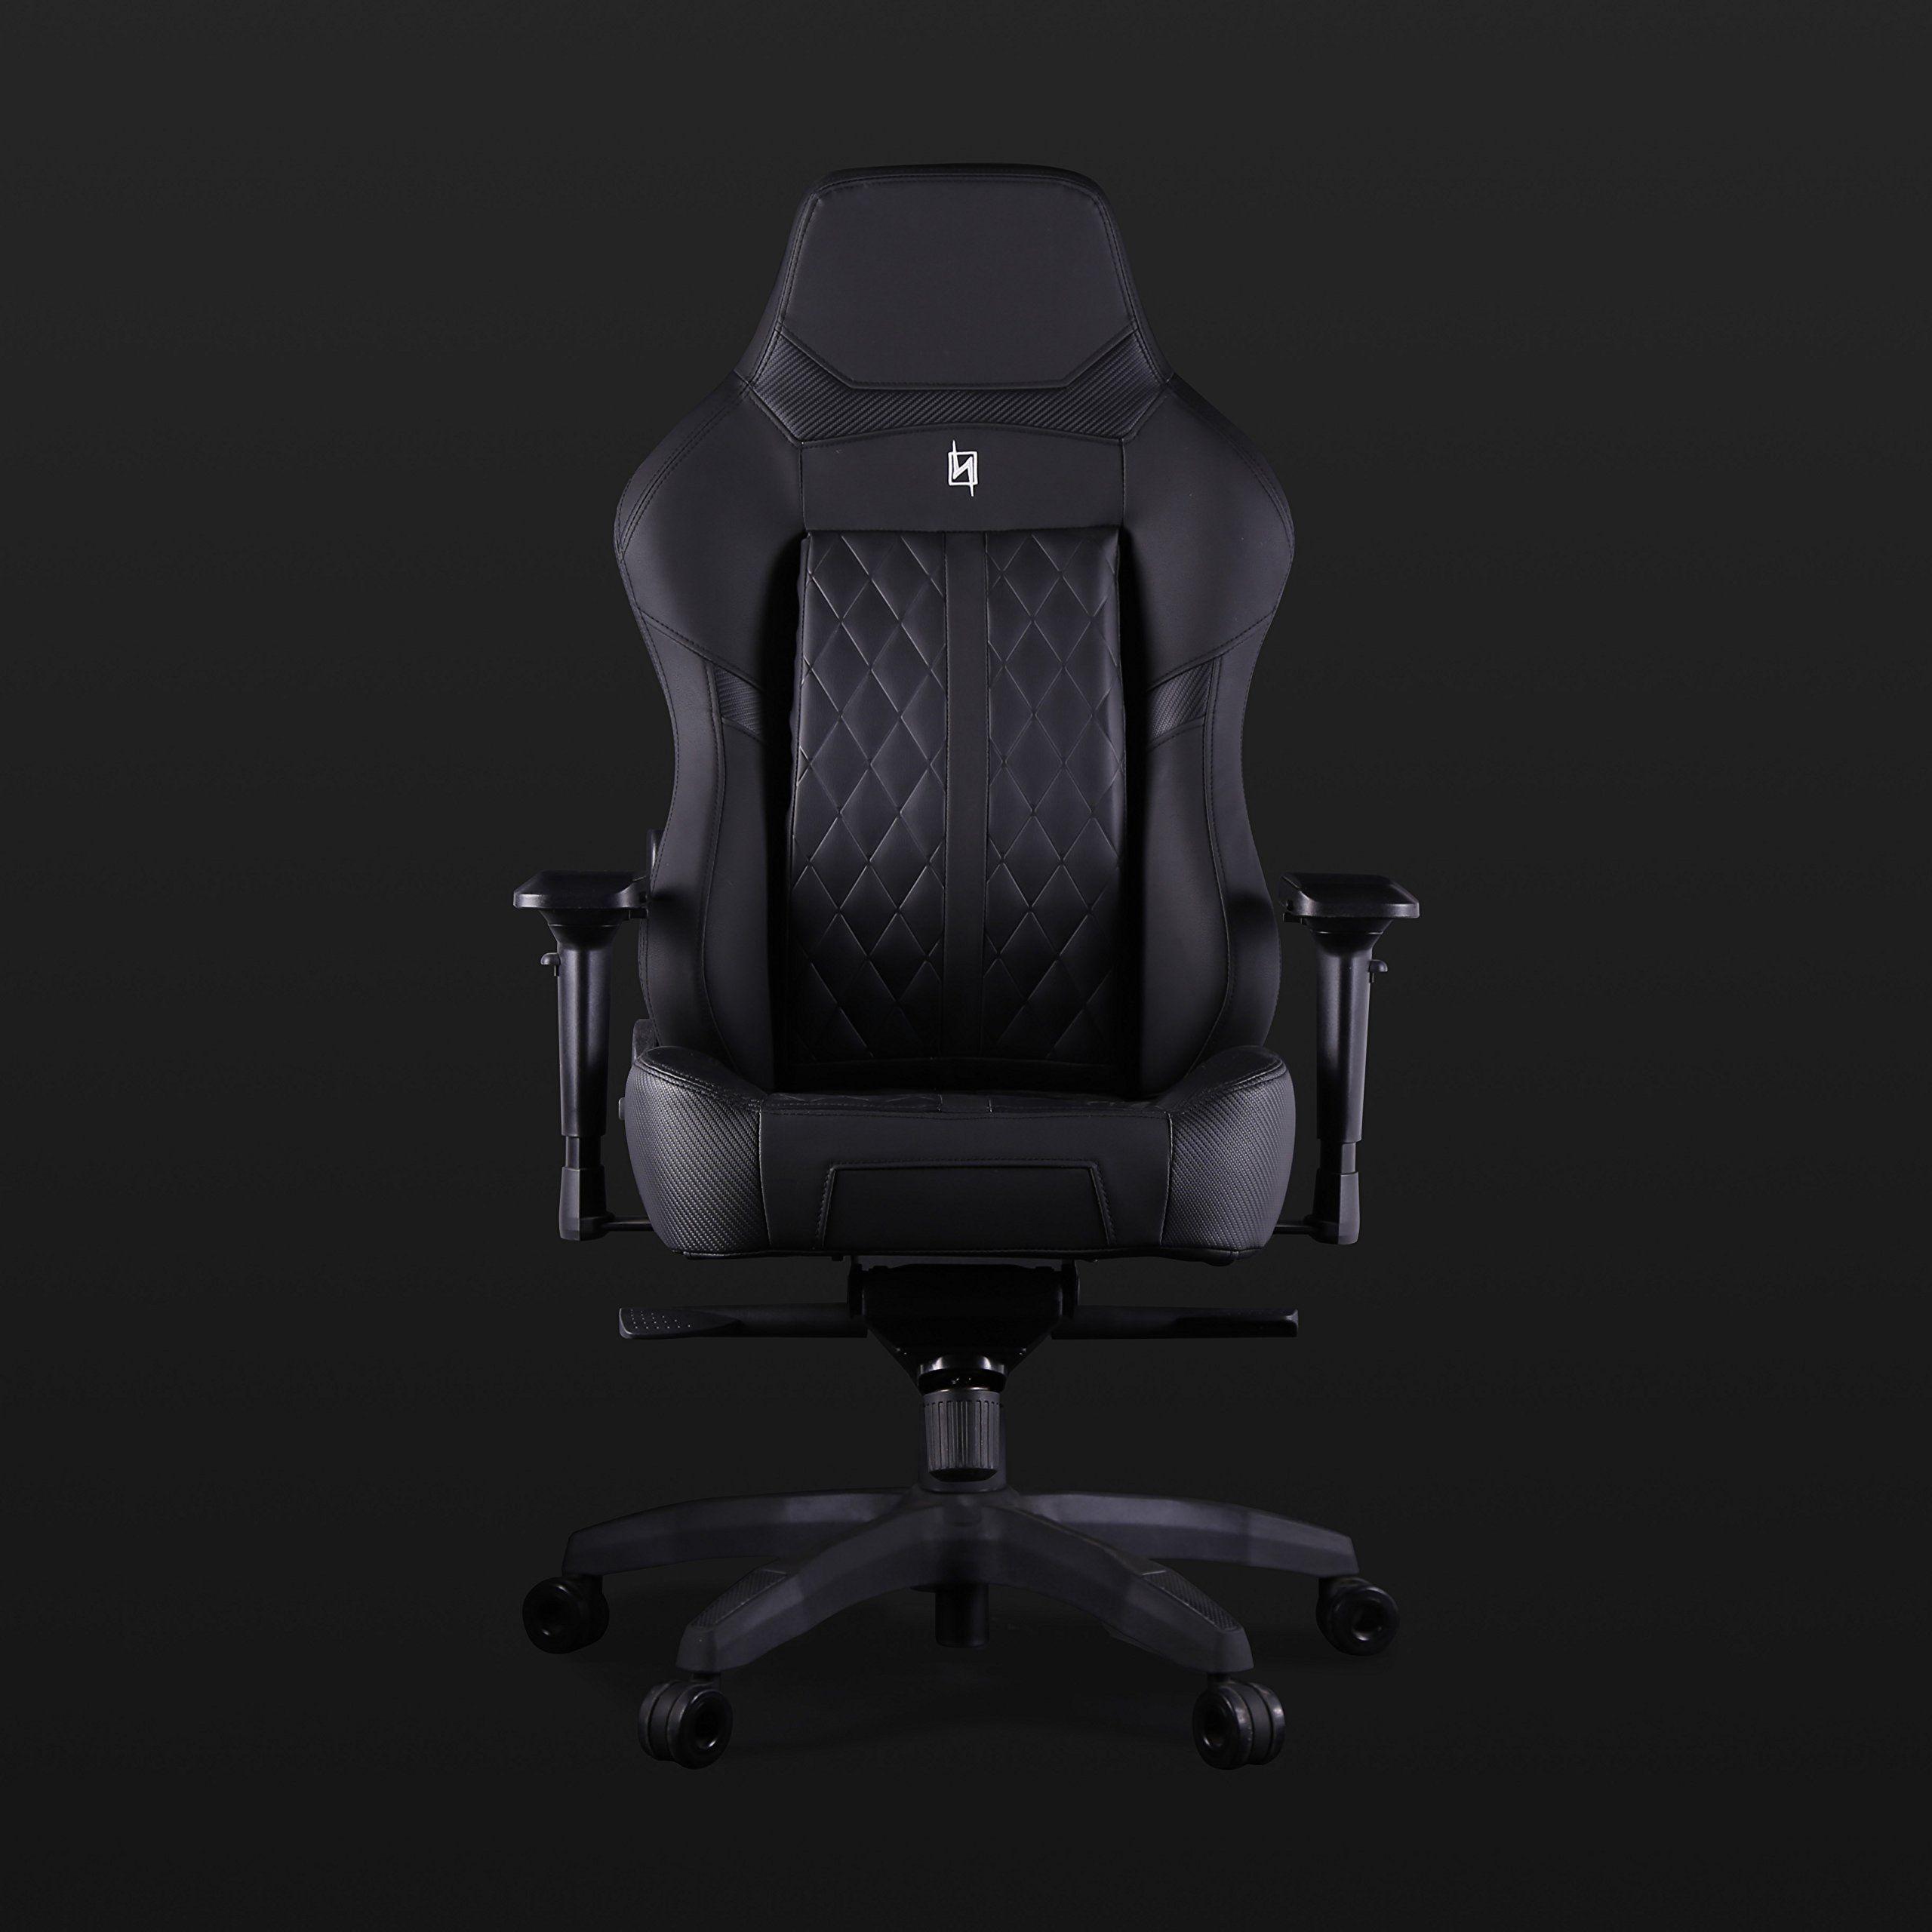 N seat pro series executive racing design computer gaming office